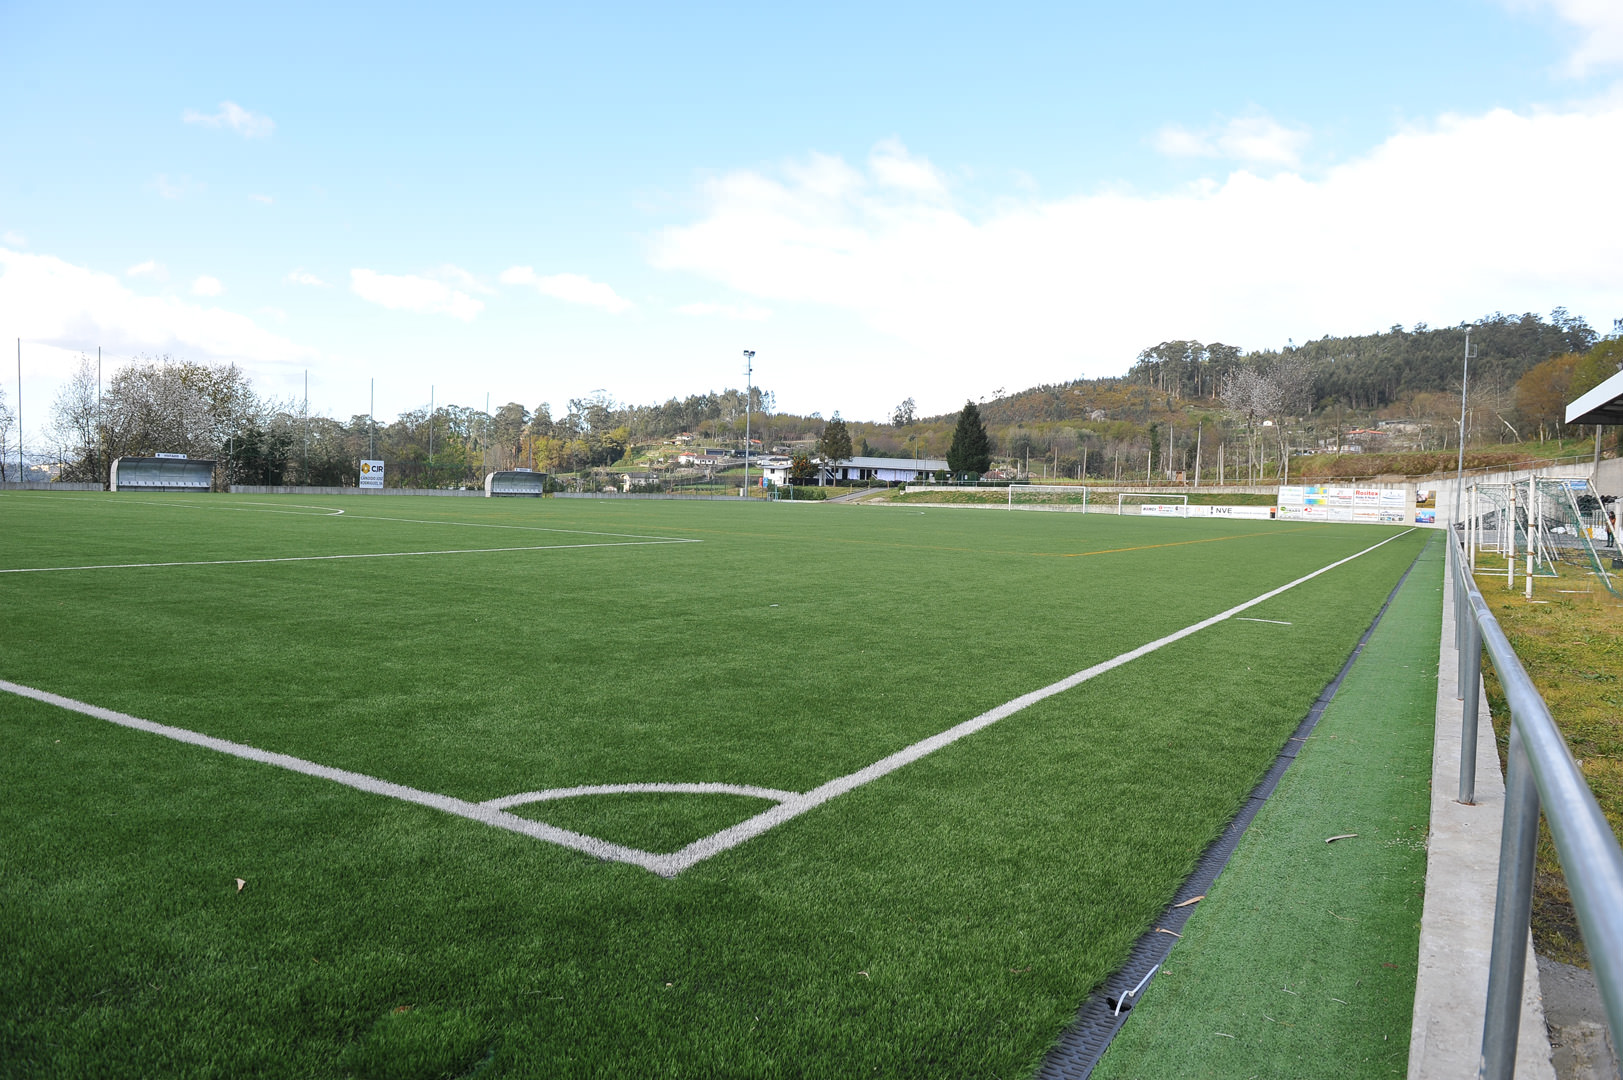 Campo de Futebol Torcatense